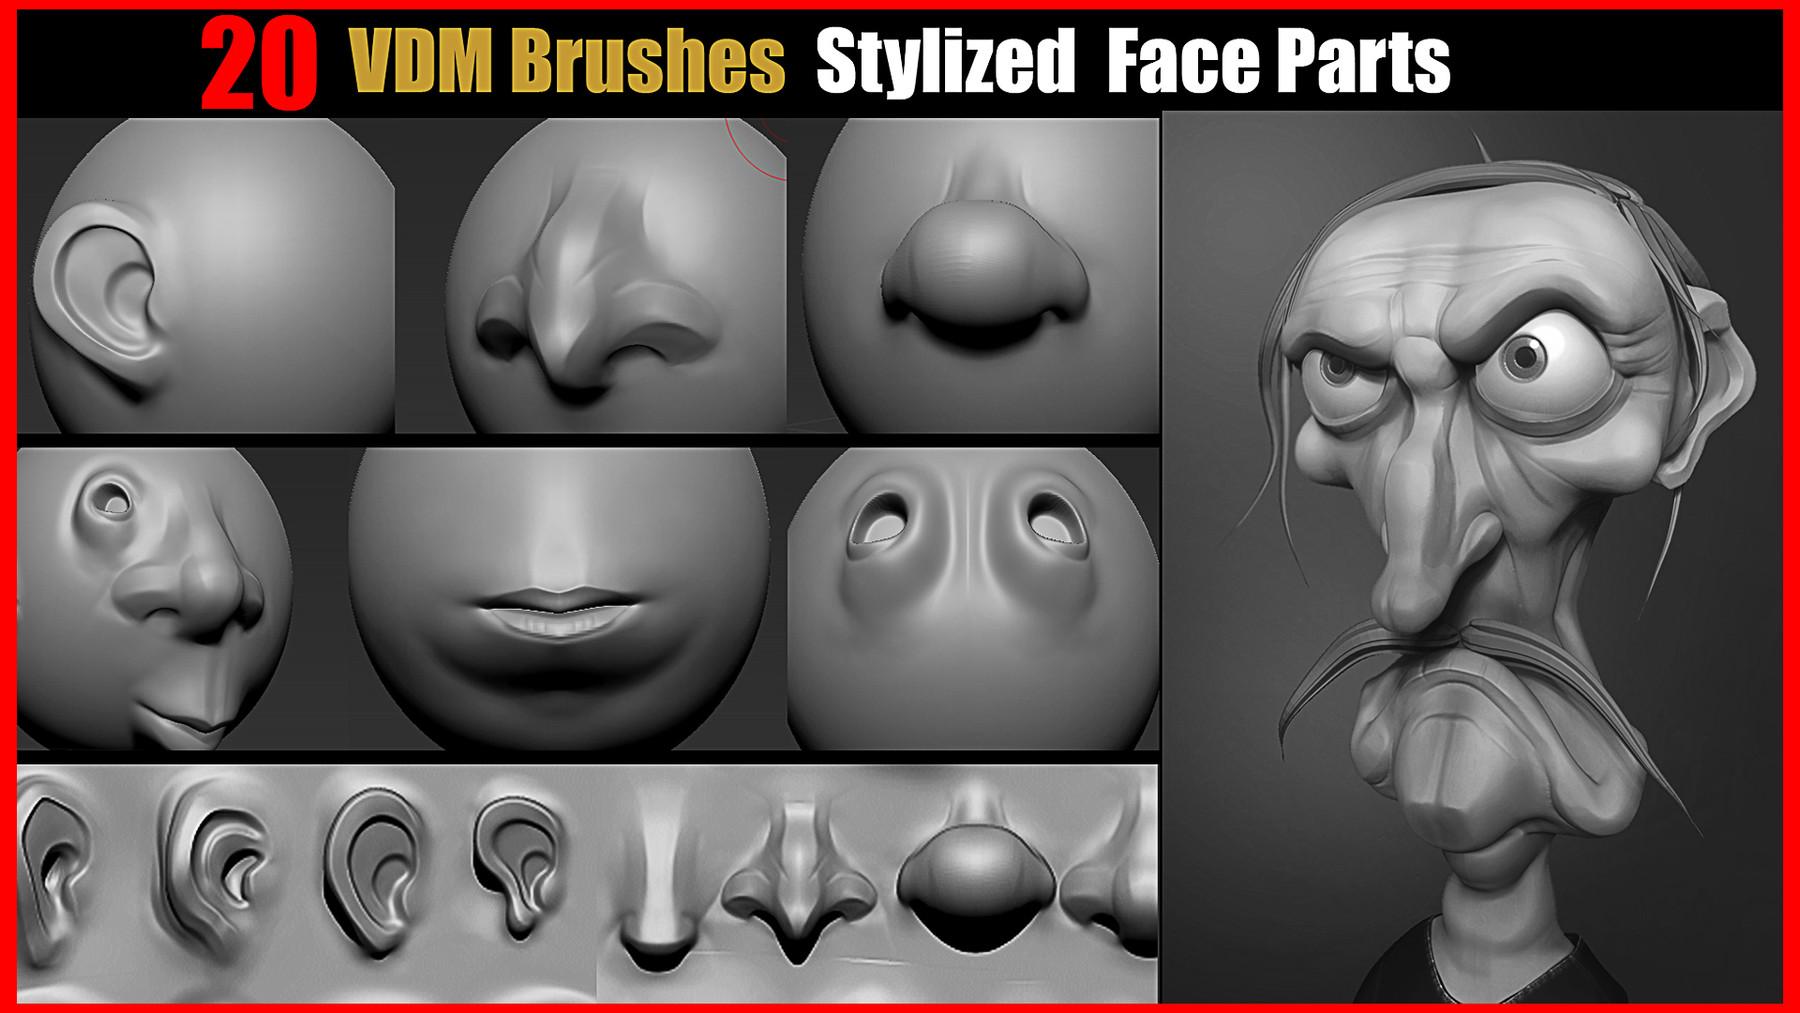 ArtStation Marketplace: Heads and Facial Assets - ArtStation Magazine